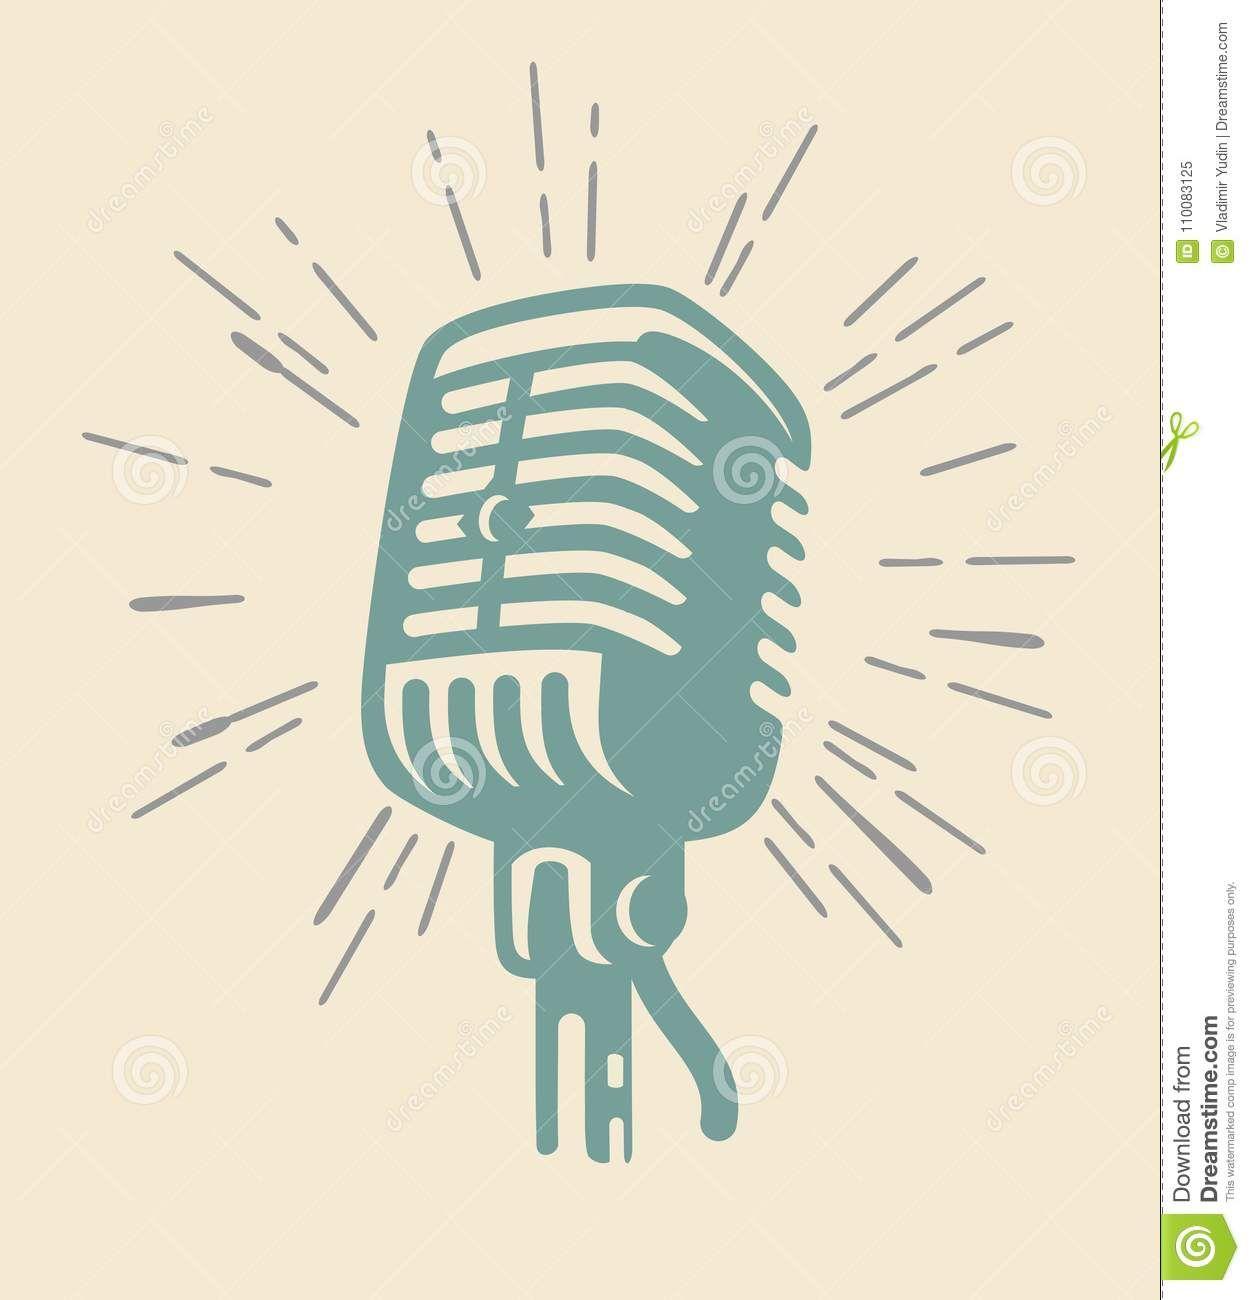 Vintage Microphone On Beig Stock Vector Illustration Of Musician 110083125 Vintage Microphone Illustration Vector Illustration Design